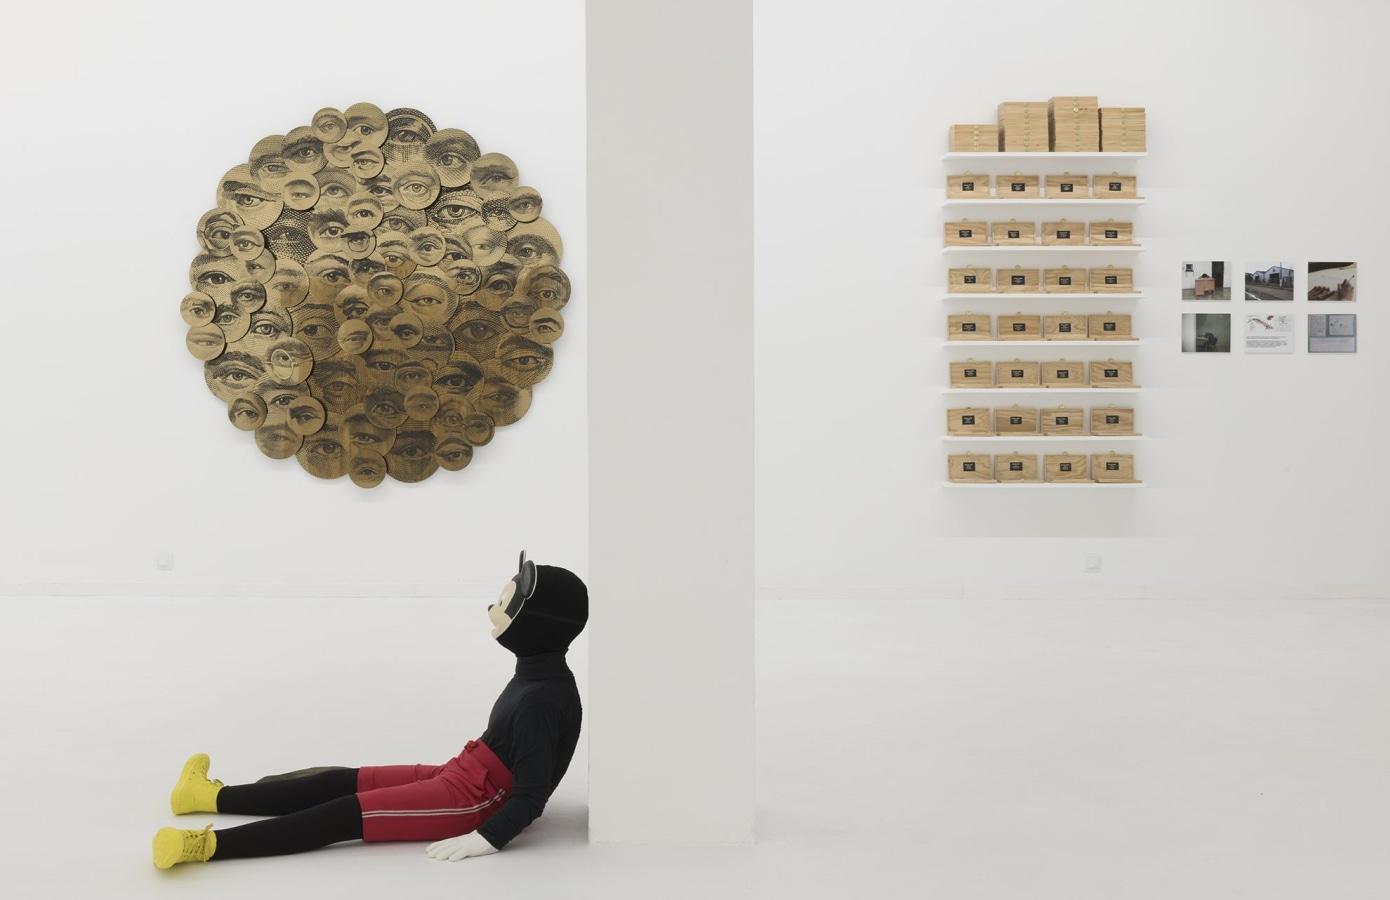 ADN Galeria, María María Acha-Kutscher, Carlos Aires, Jordi Colomer, Nuria Güell, Margaret Harrison, Eugenio Merino, Avelino Sala,